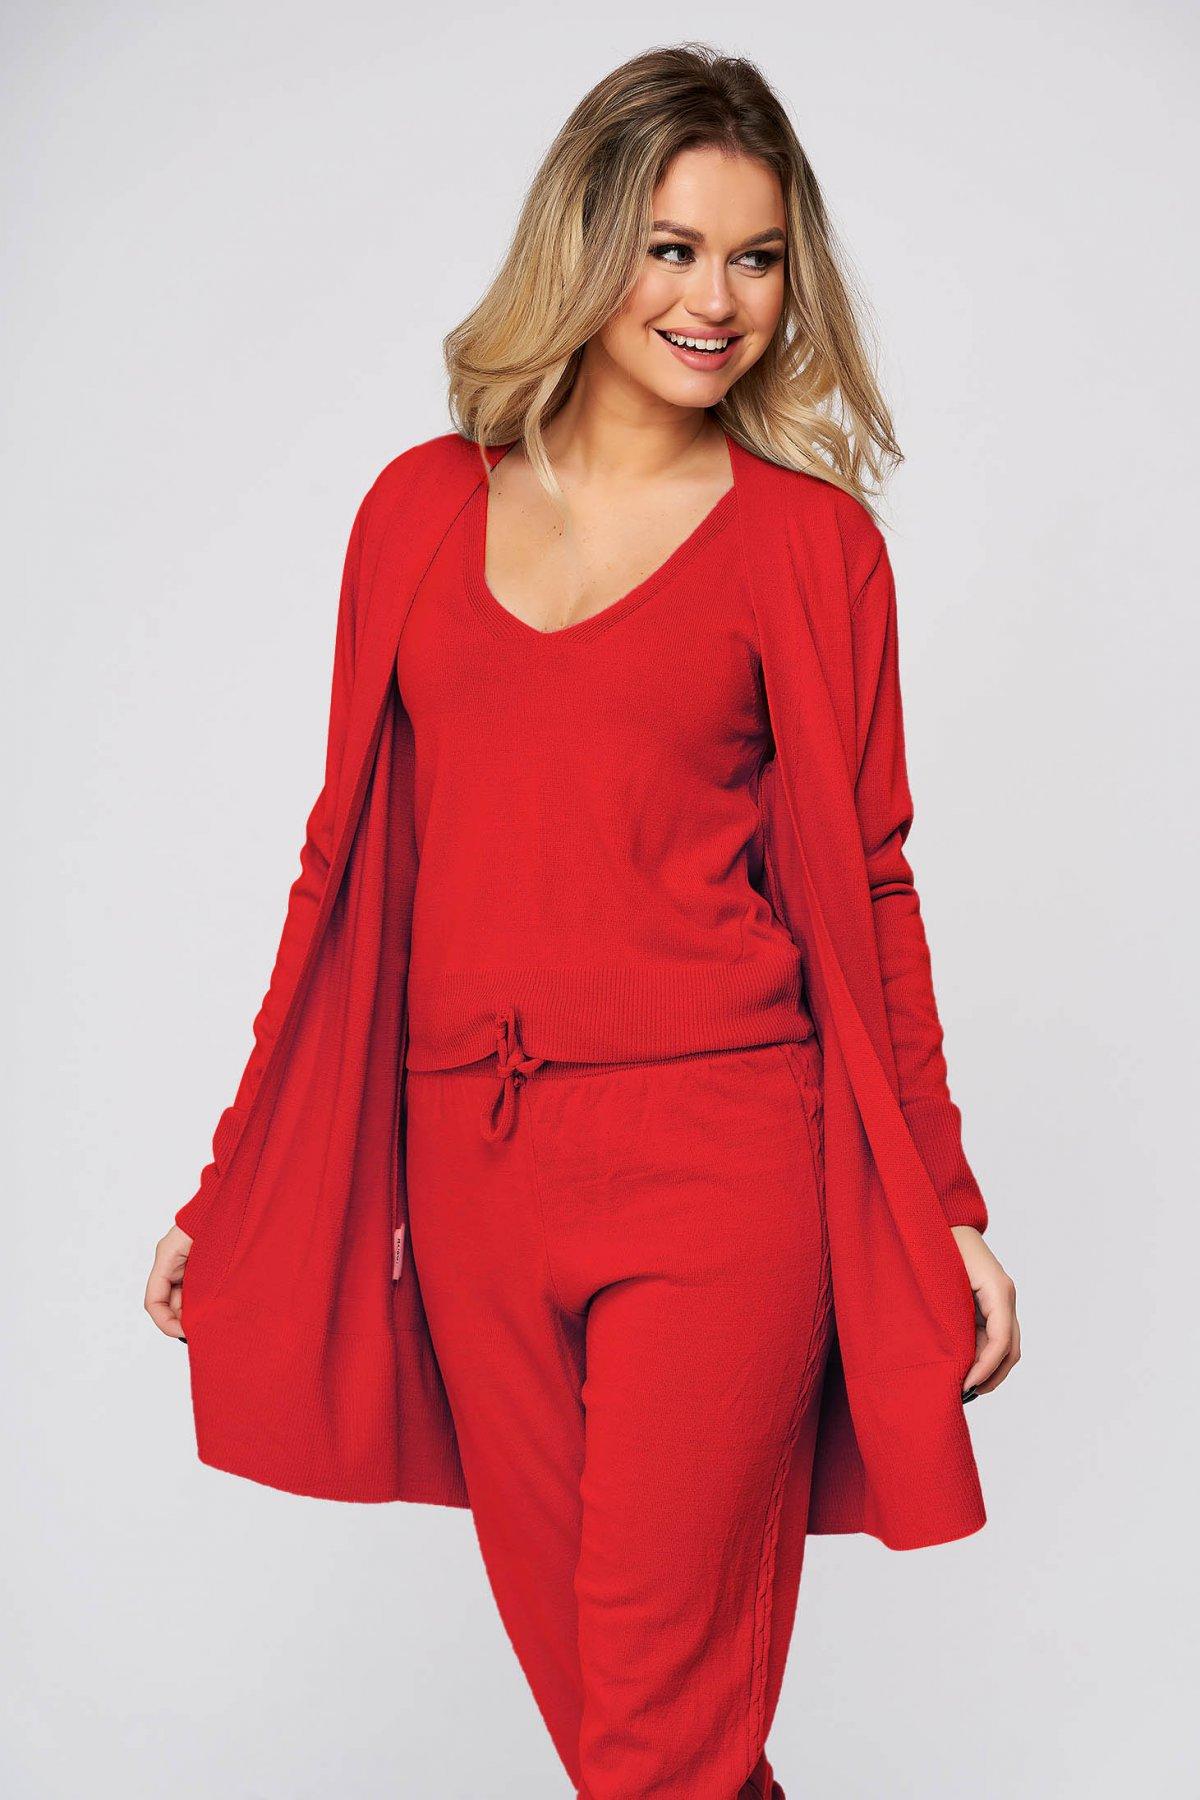 Trening dama SunShine rosii casual din material tricotat